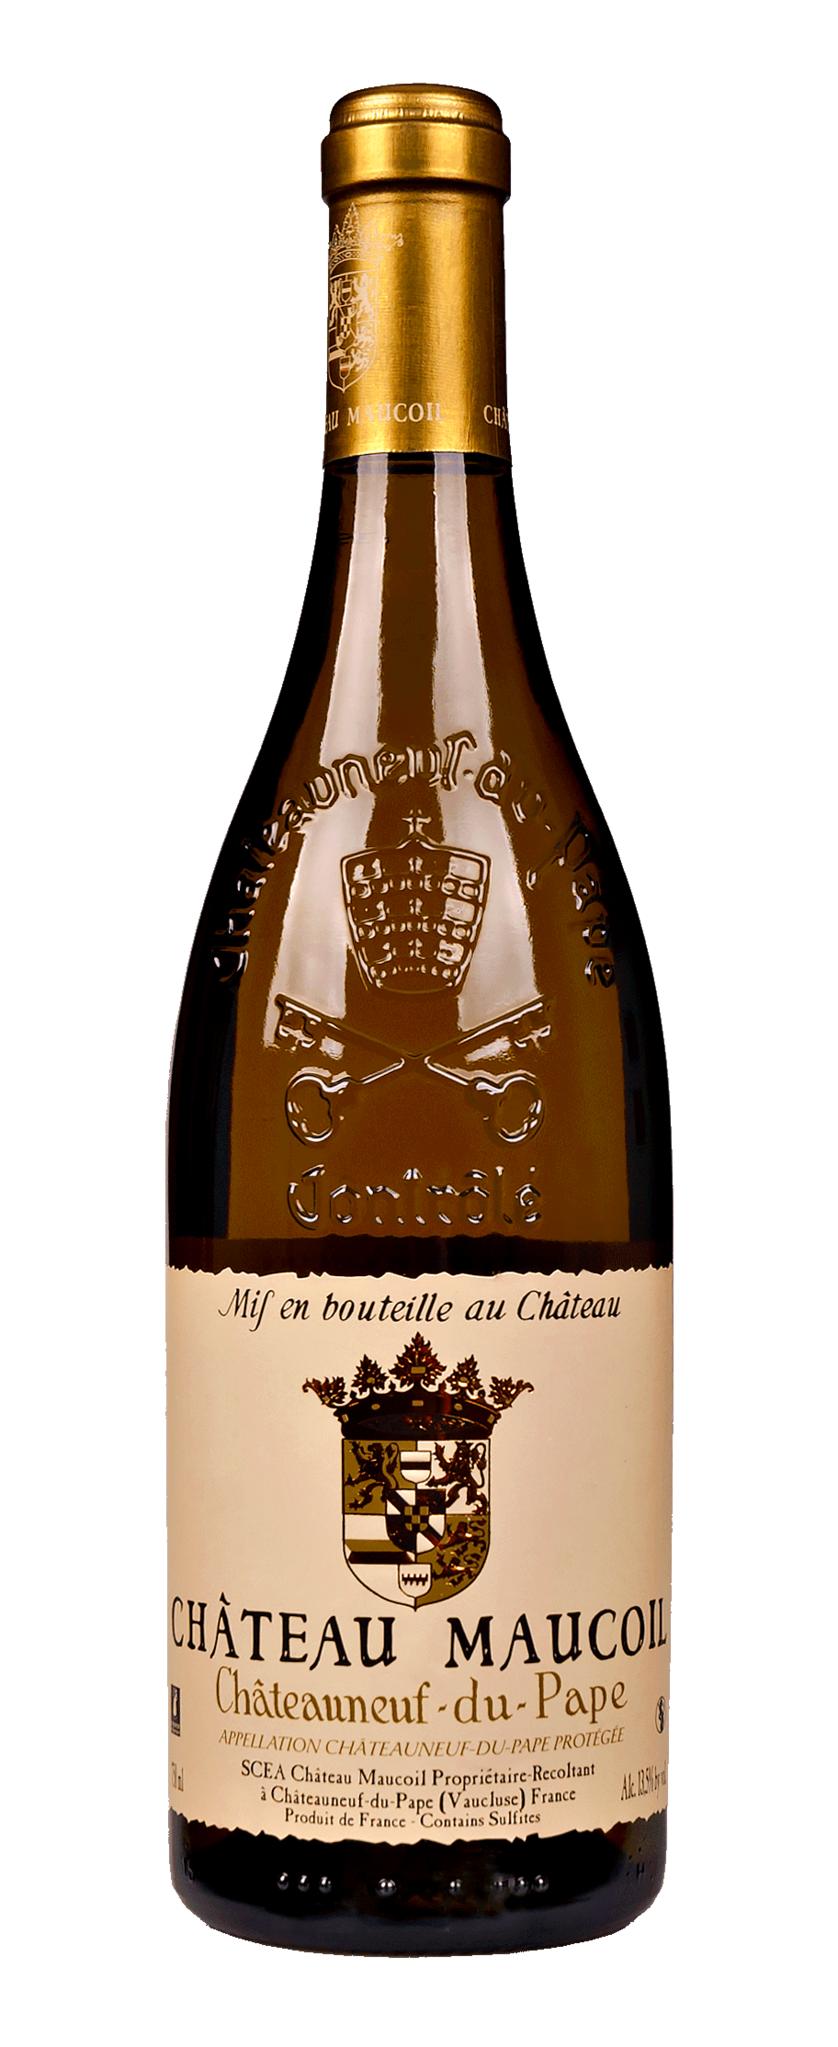 Maucoil, Château - Rhône 2018 Chateauneuf-du-Pape blanc, Chateau Maucoil